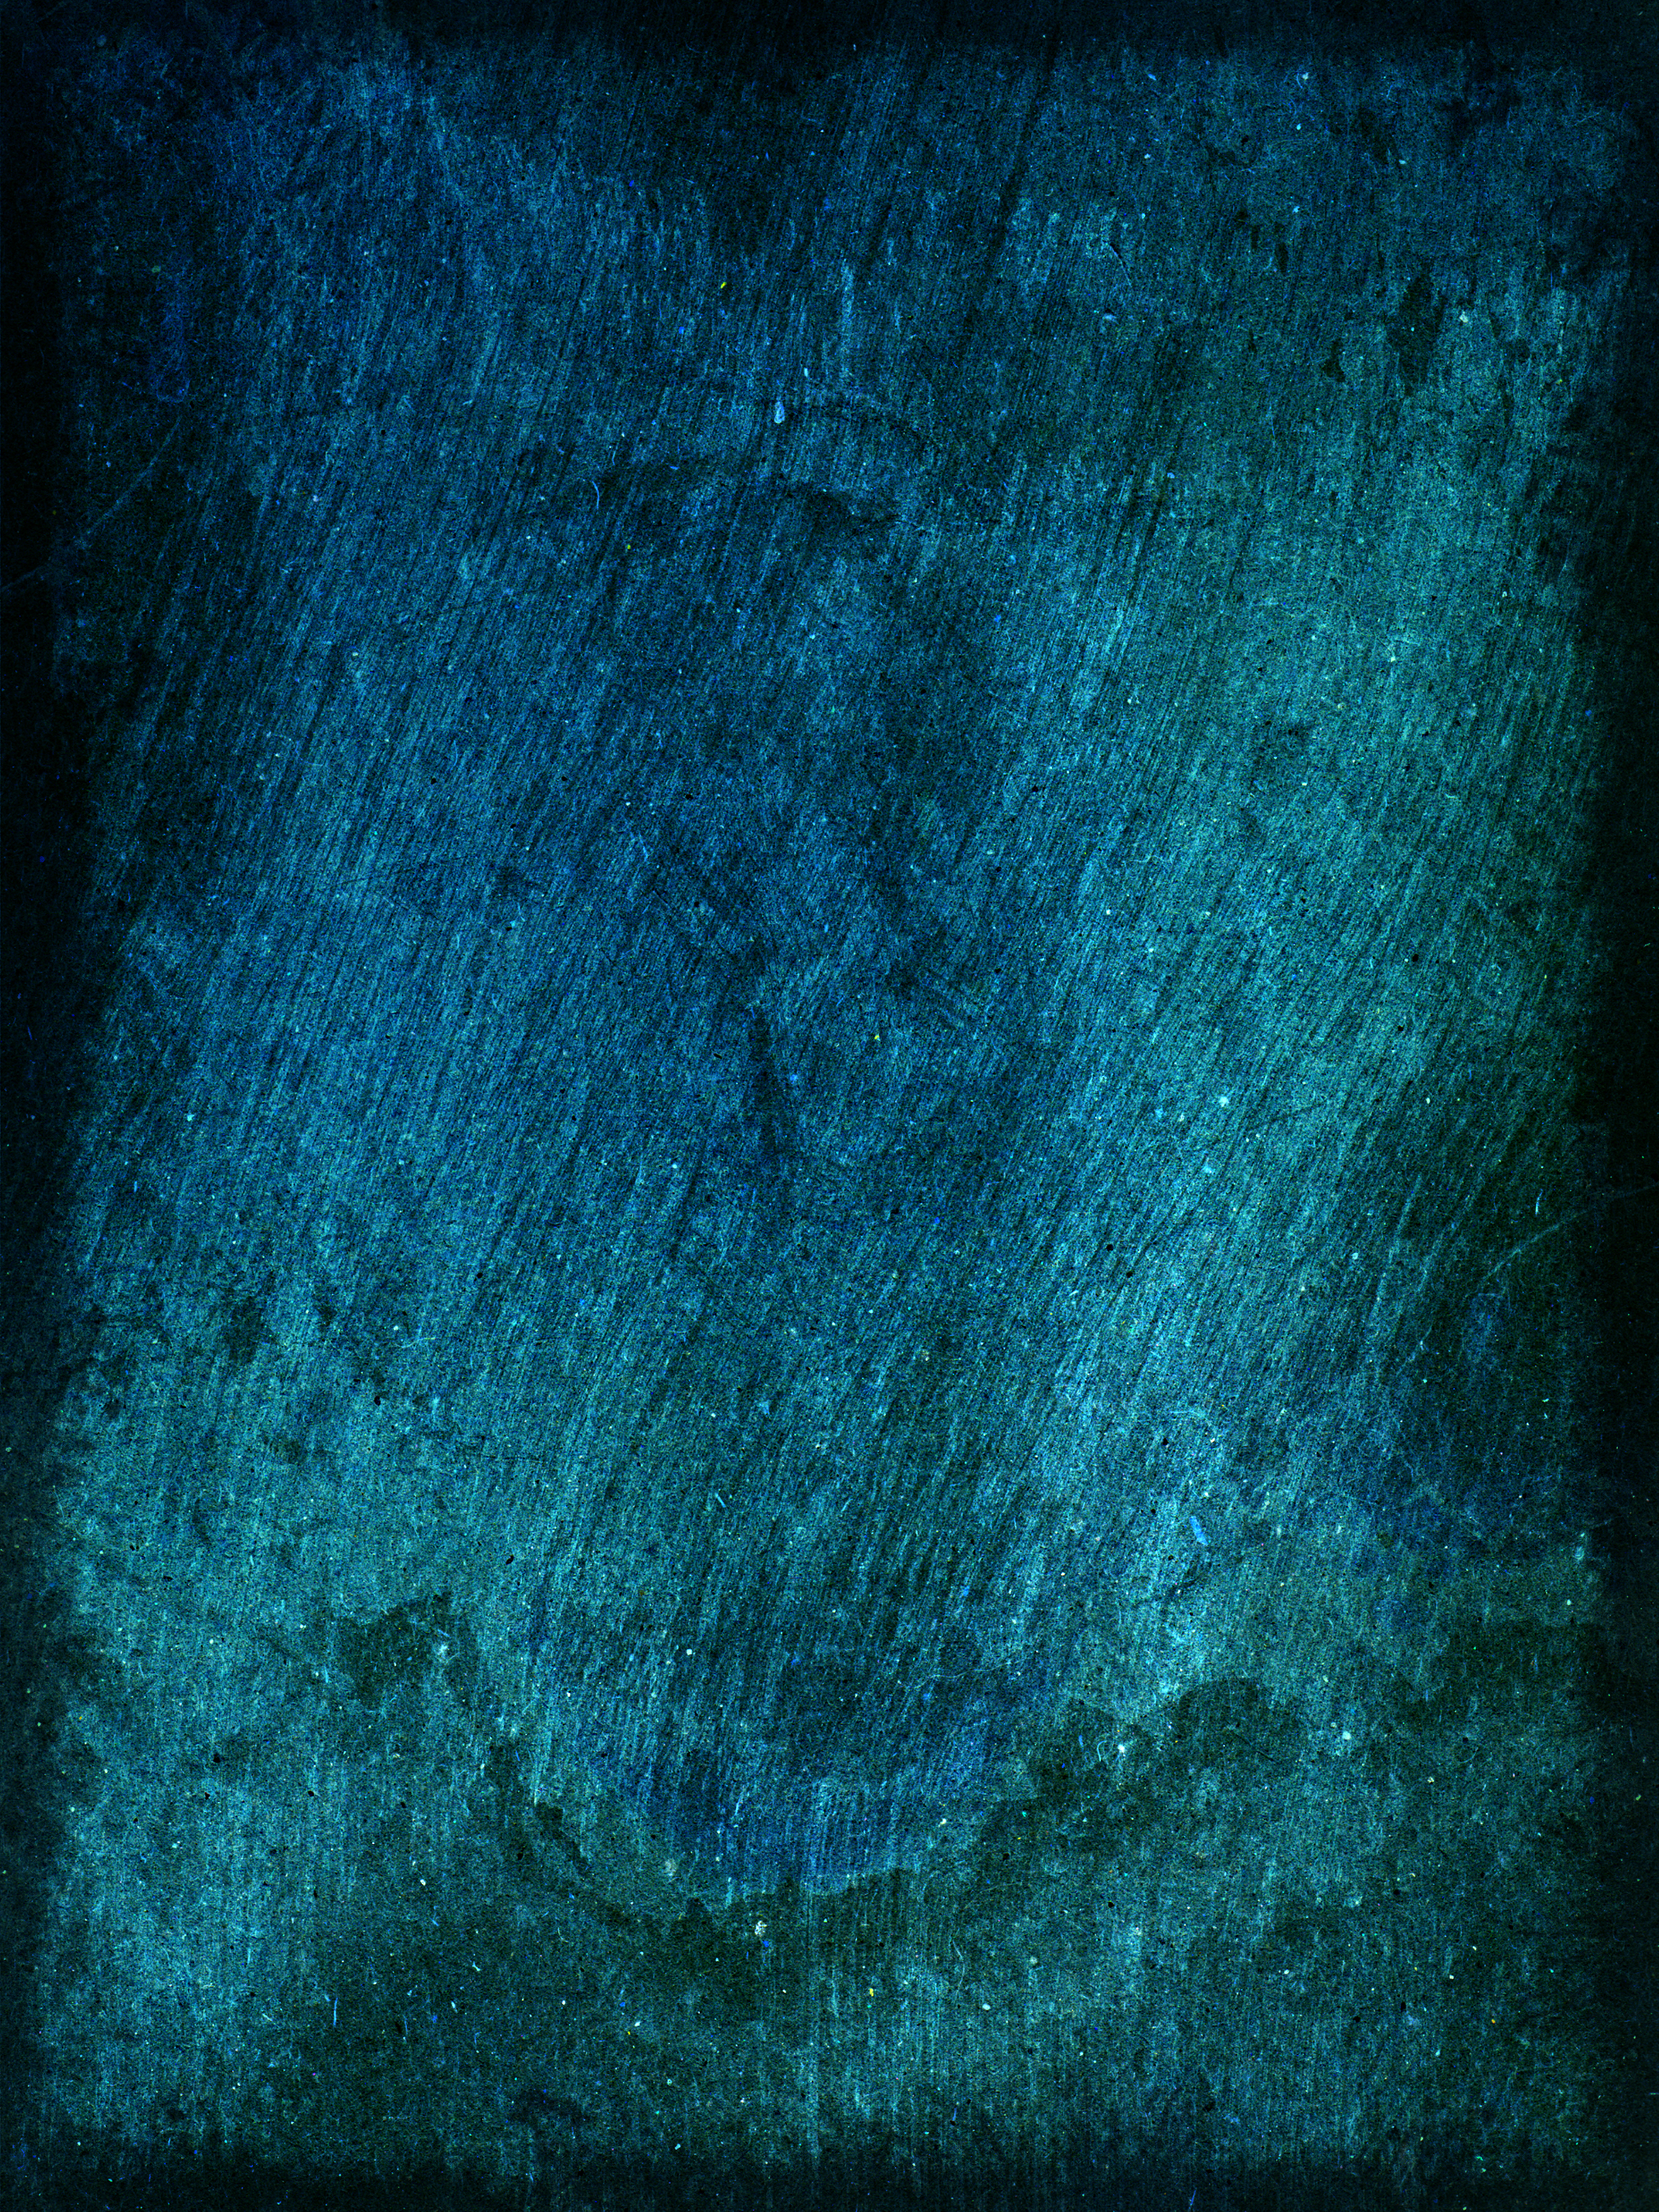 Rough Texture Background: Melanie Calvert - Author